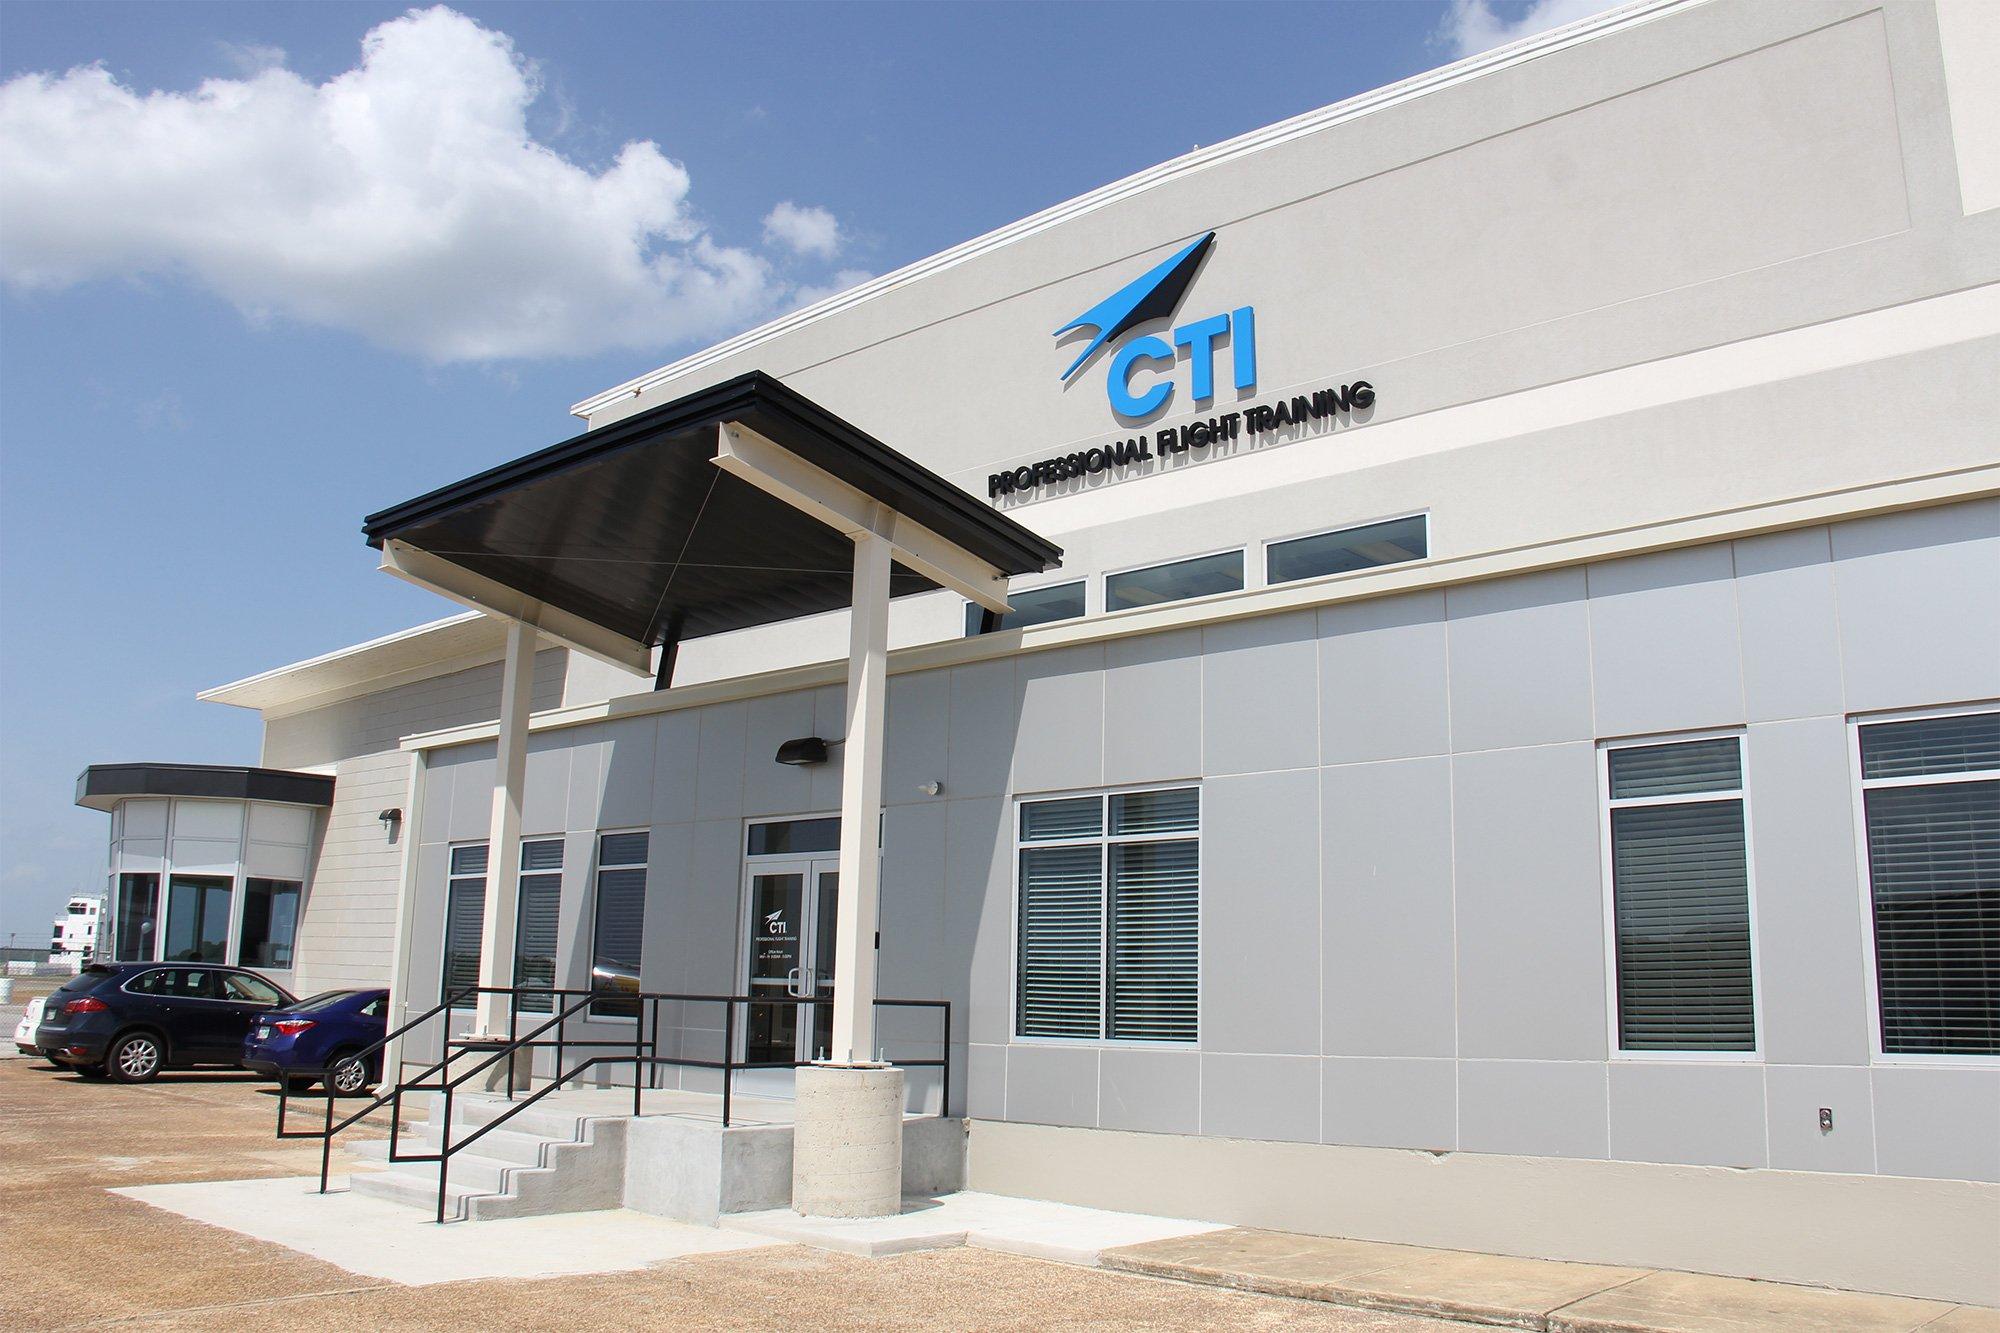 Exterior photo of CTI building at Millington Airport